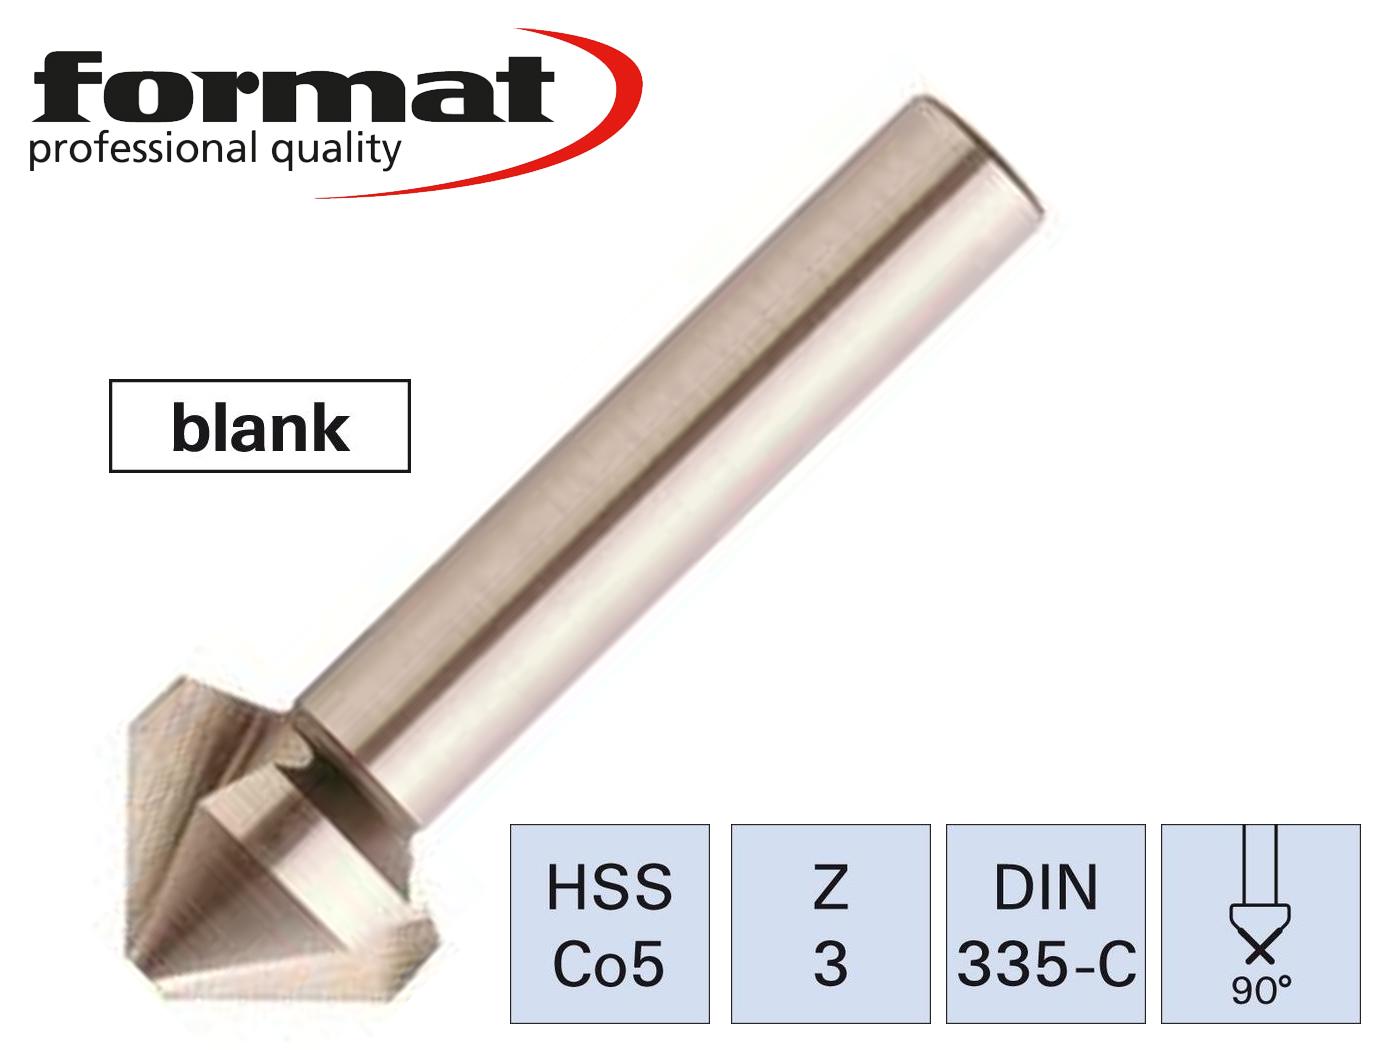 verzinkboor ongelijk verdeeld ZrN DIN335 C 90G HSS4,30mm